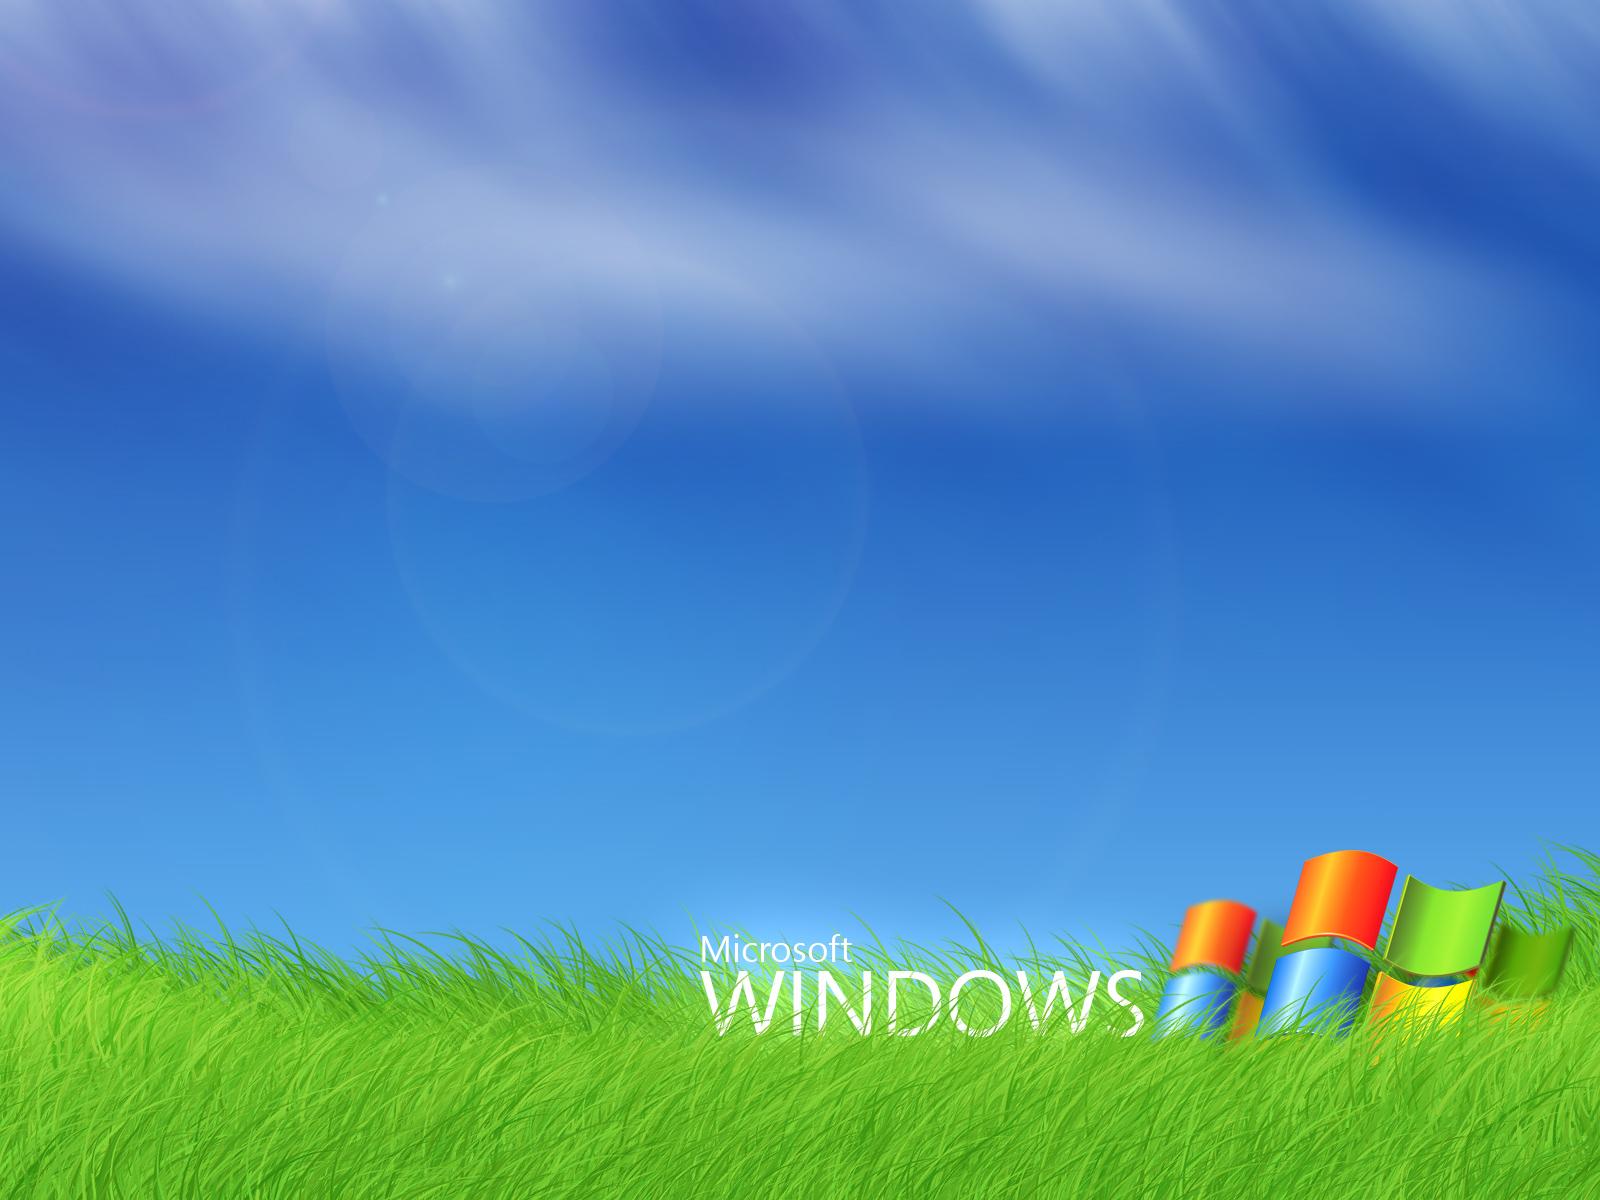 http://2.bp.blogspot.com/-5bV9yw-WO-8/Truzs63B2tI/AAAAAAAARBs/IdtXqHCEBuU/s1600/Mooie-windows-achtergronden-leuke-hd-windows-wallpapers-afbeelding-plaatje-24.jpg